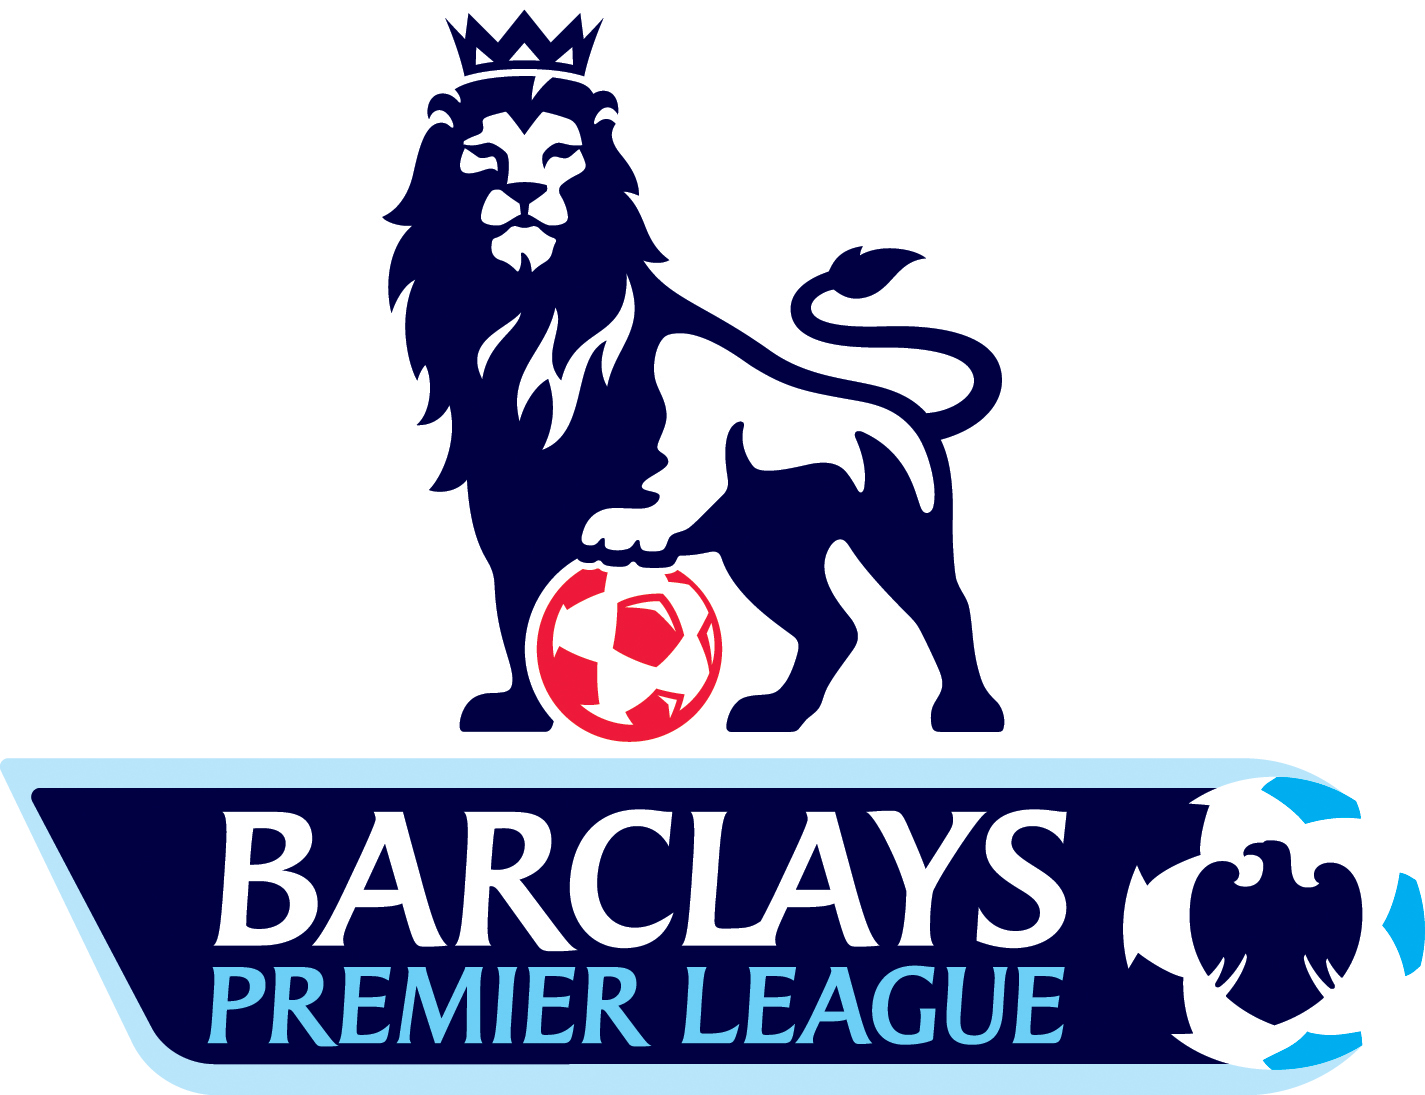 Premier League results. Day 2